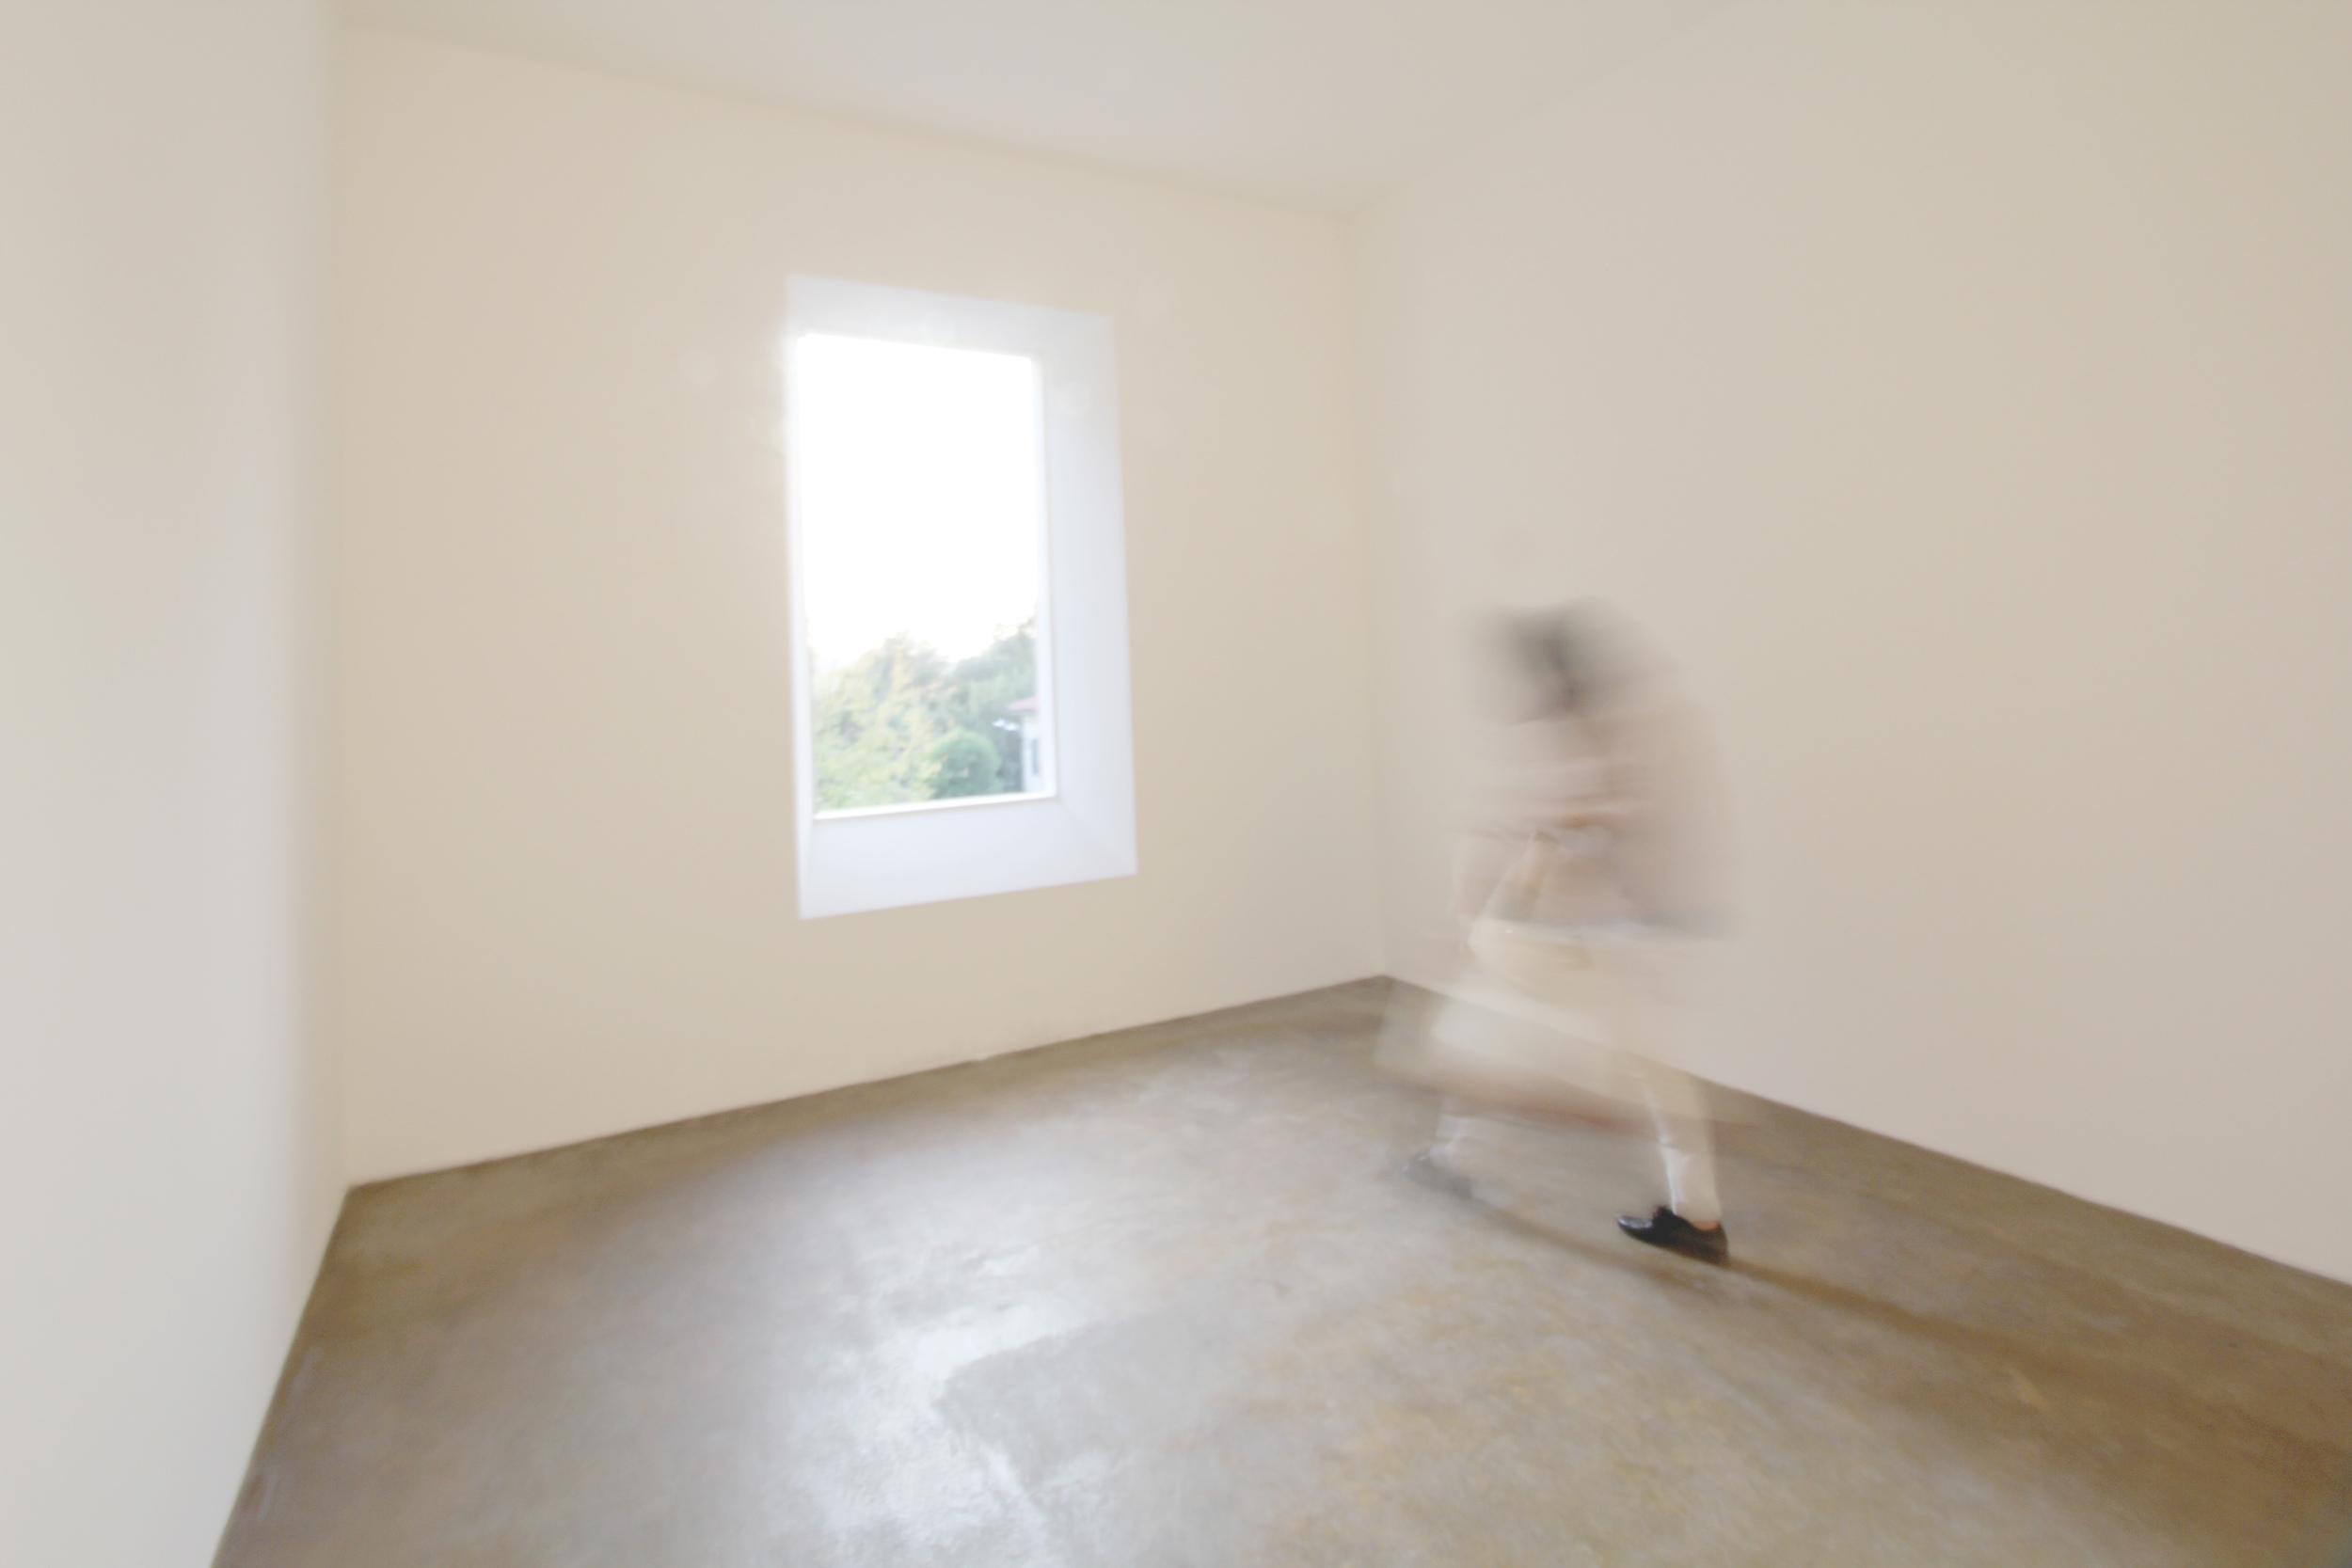 Varese Window Room.  Robert Irwin ; Vertical Portal Cut to Outside Park.